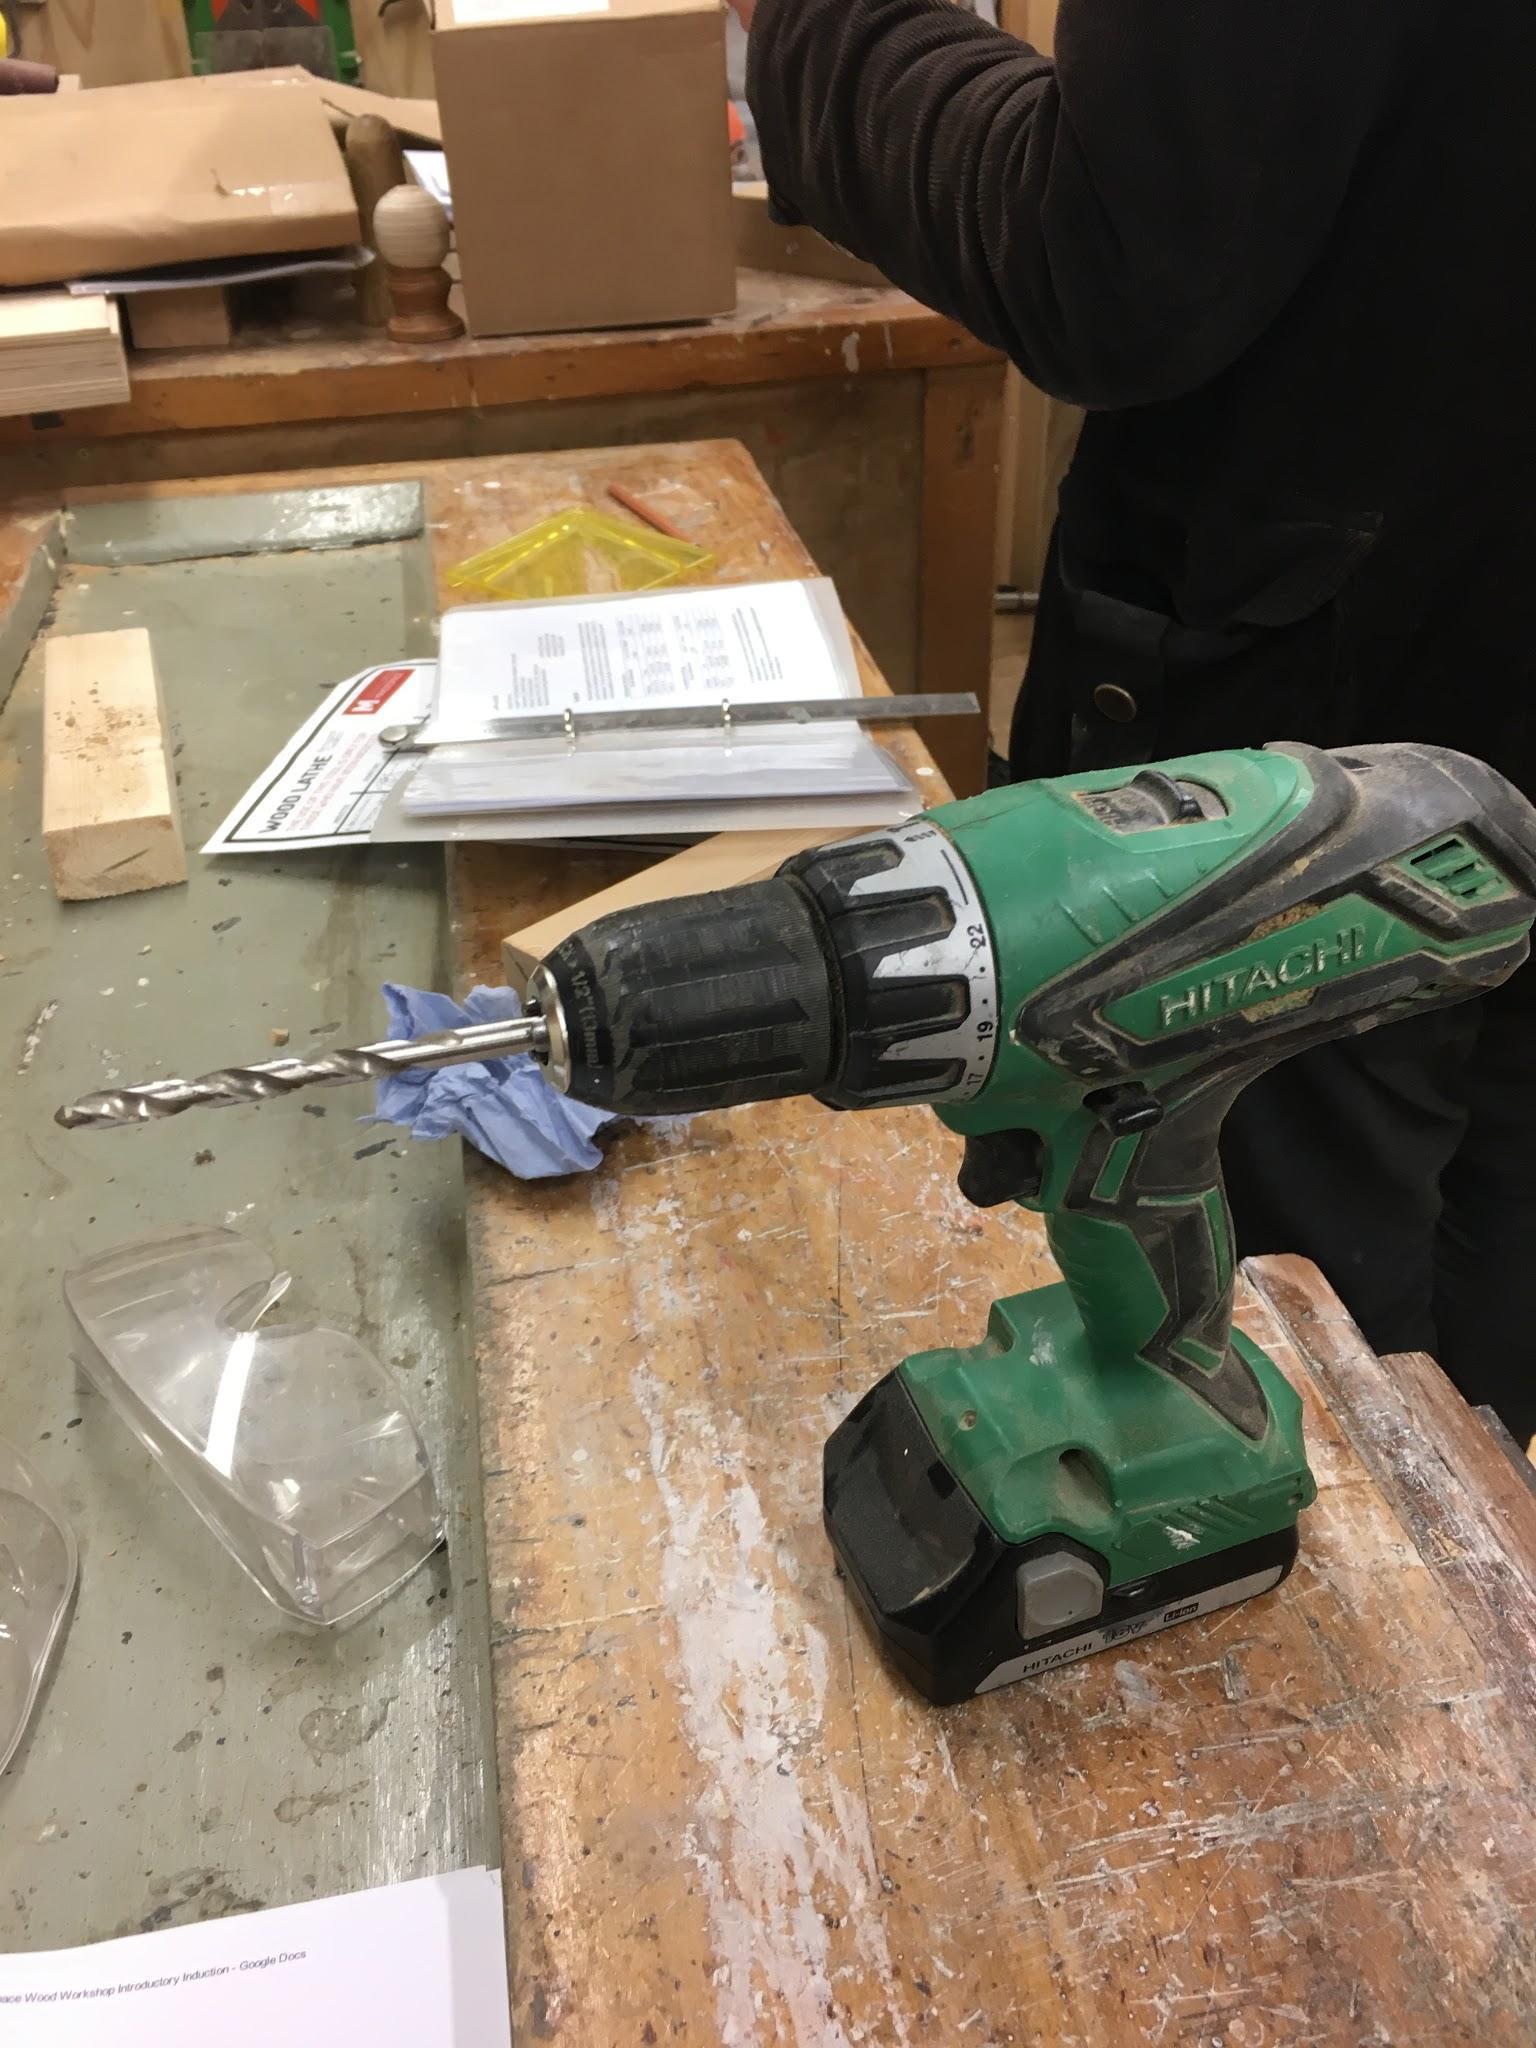 Wood Workshop Induction 3 Hand Held Power Tools Tools